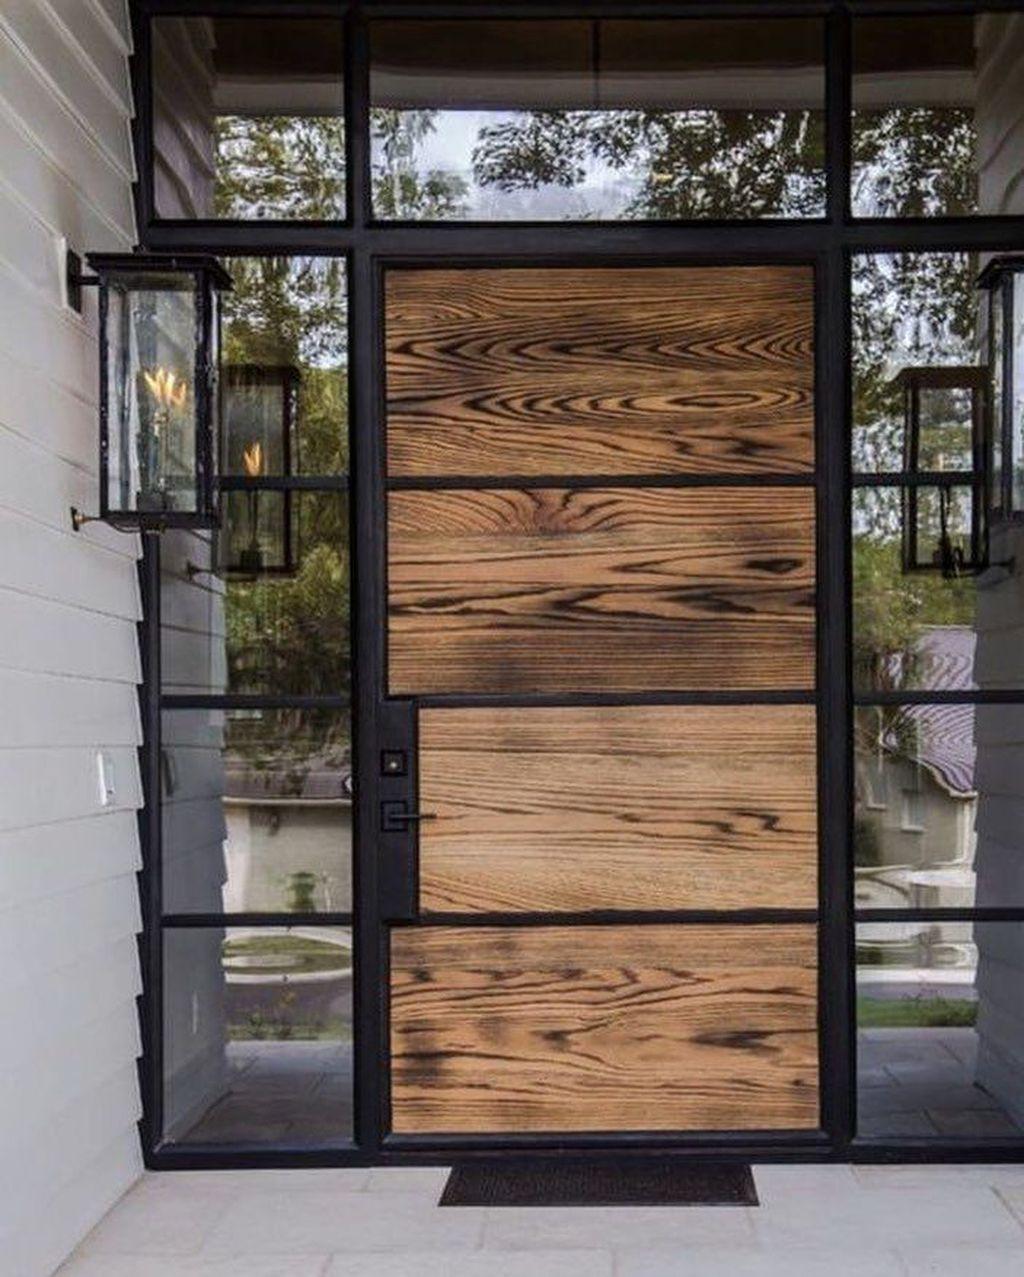 The Best Modern Front Entrance Exterior Design Ideas 27